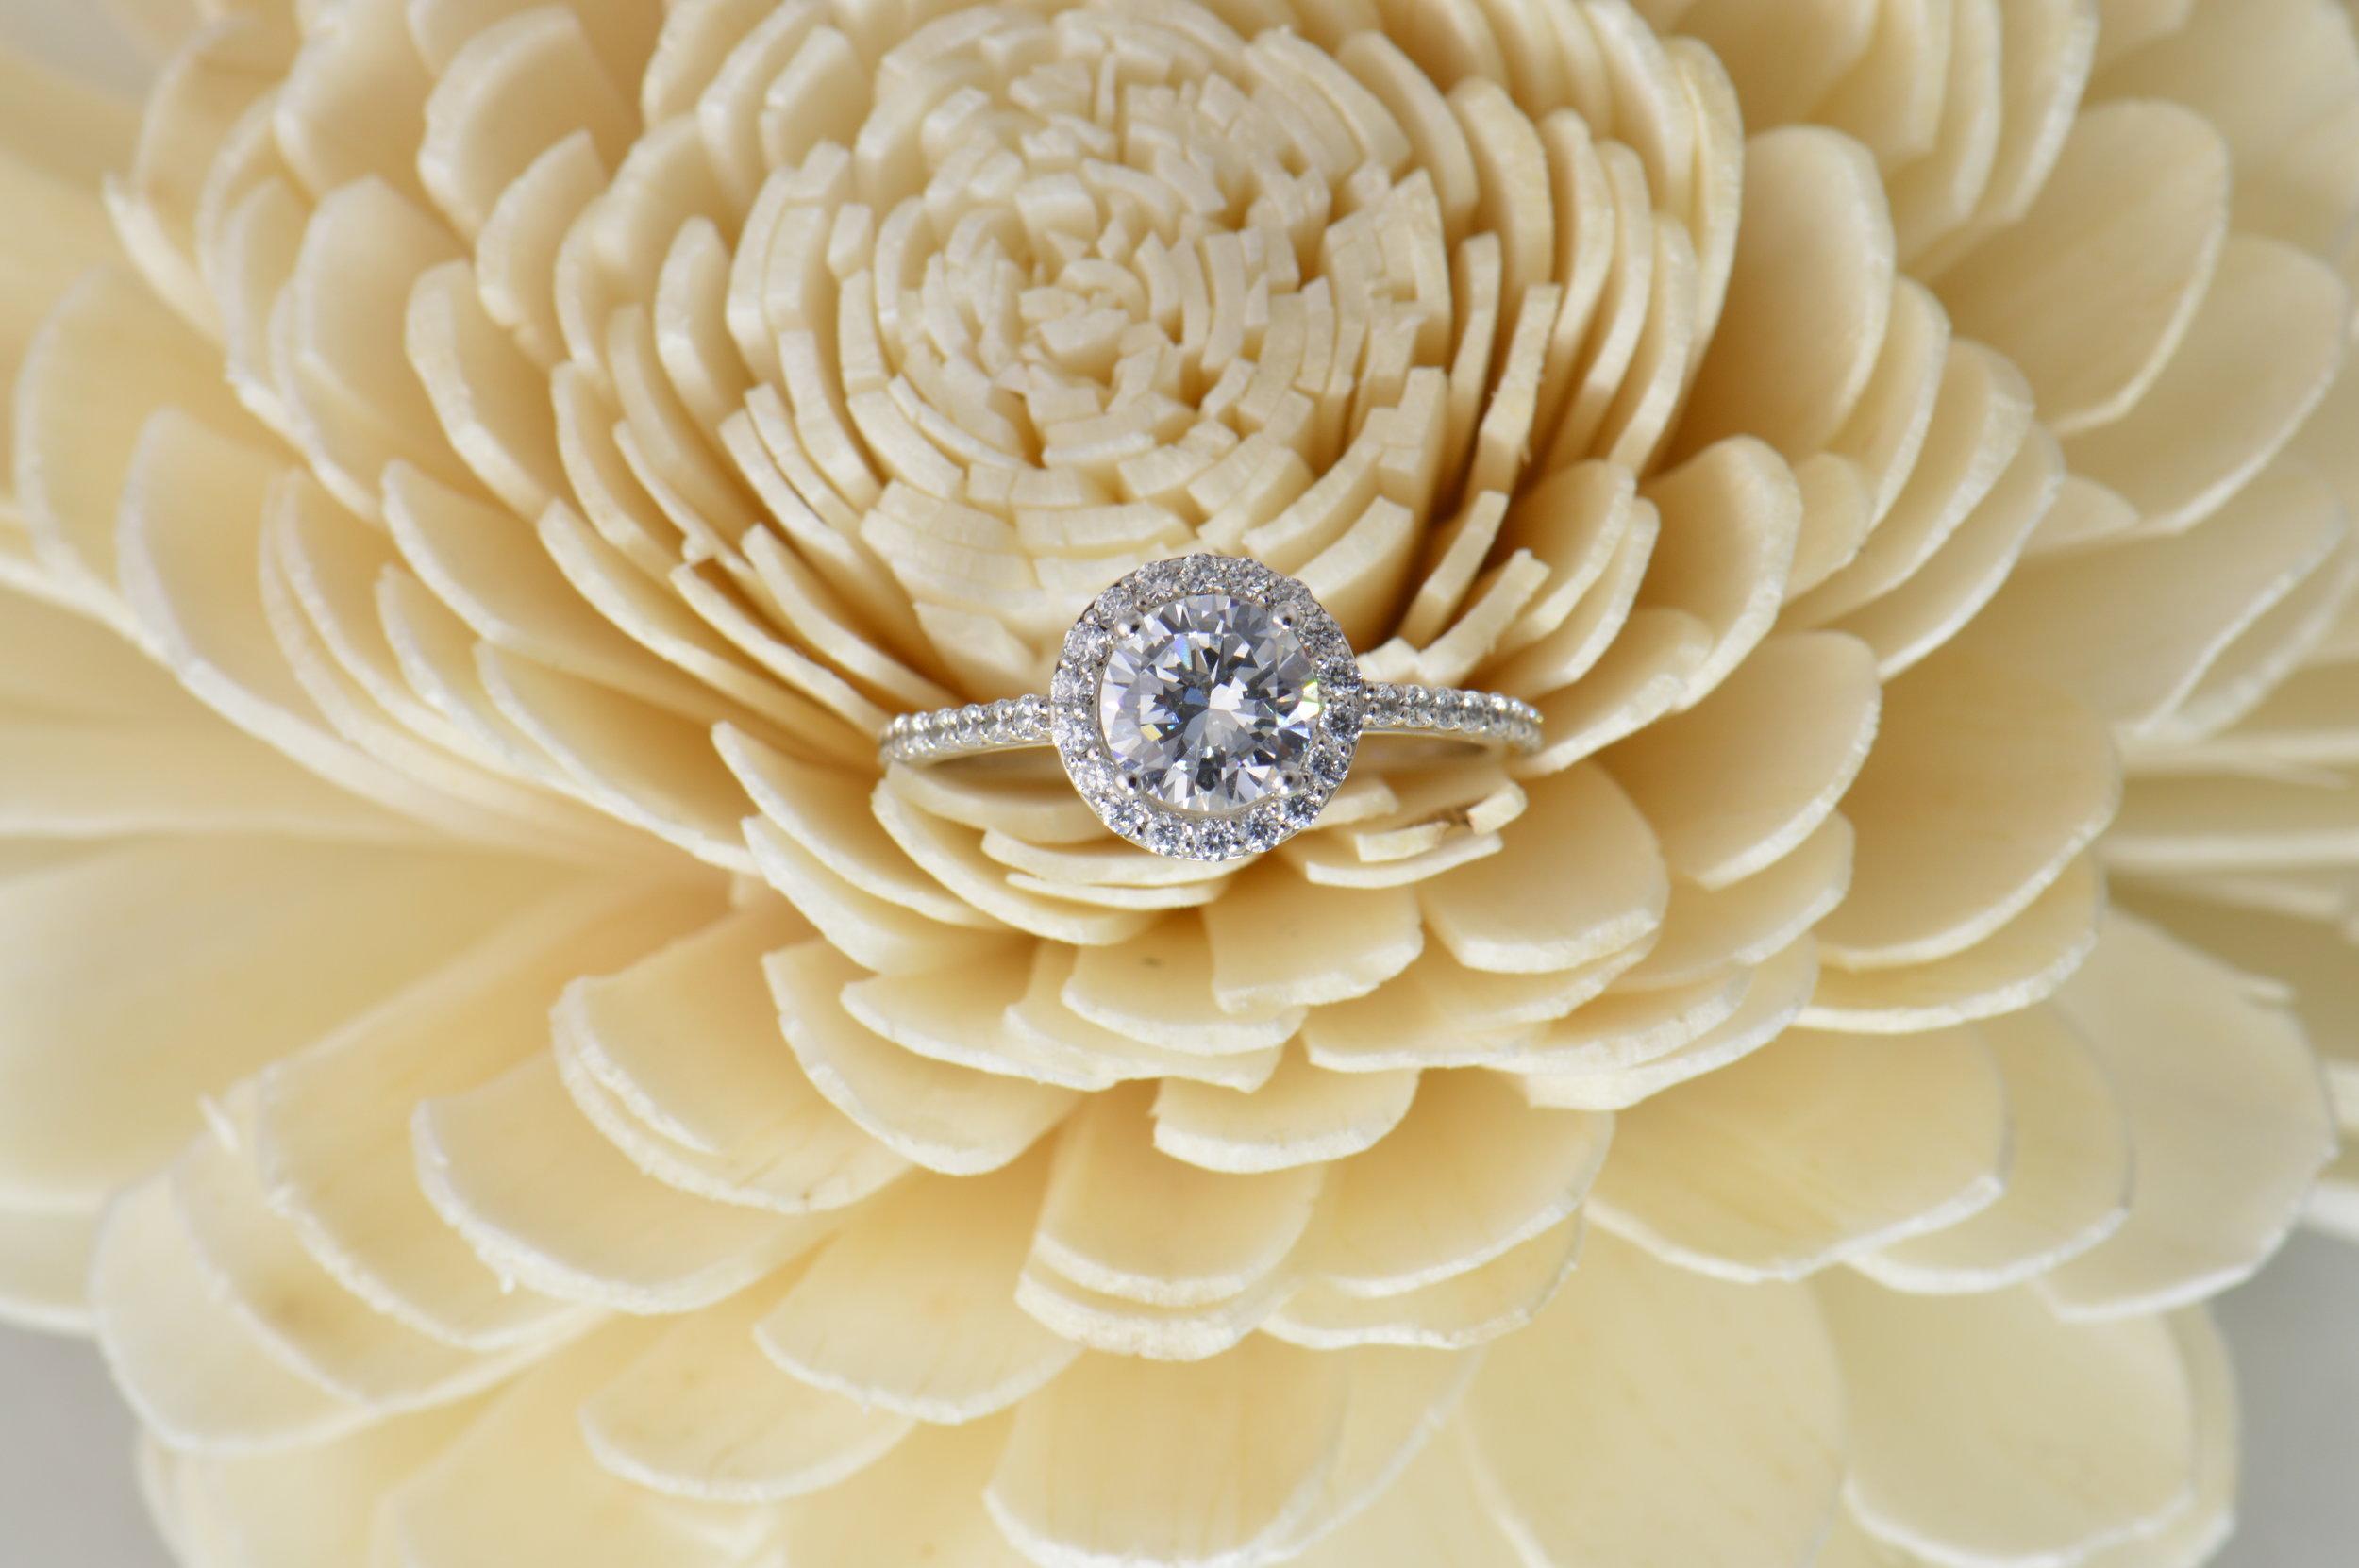 darvier-halo-diamond-engagement-ring.JPG